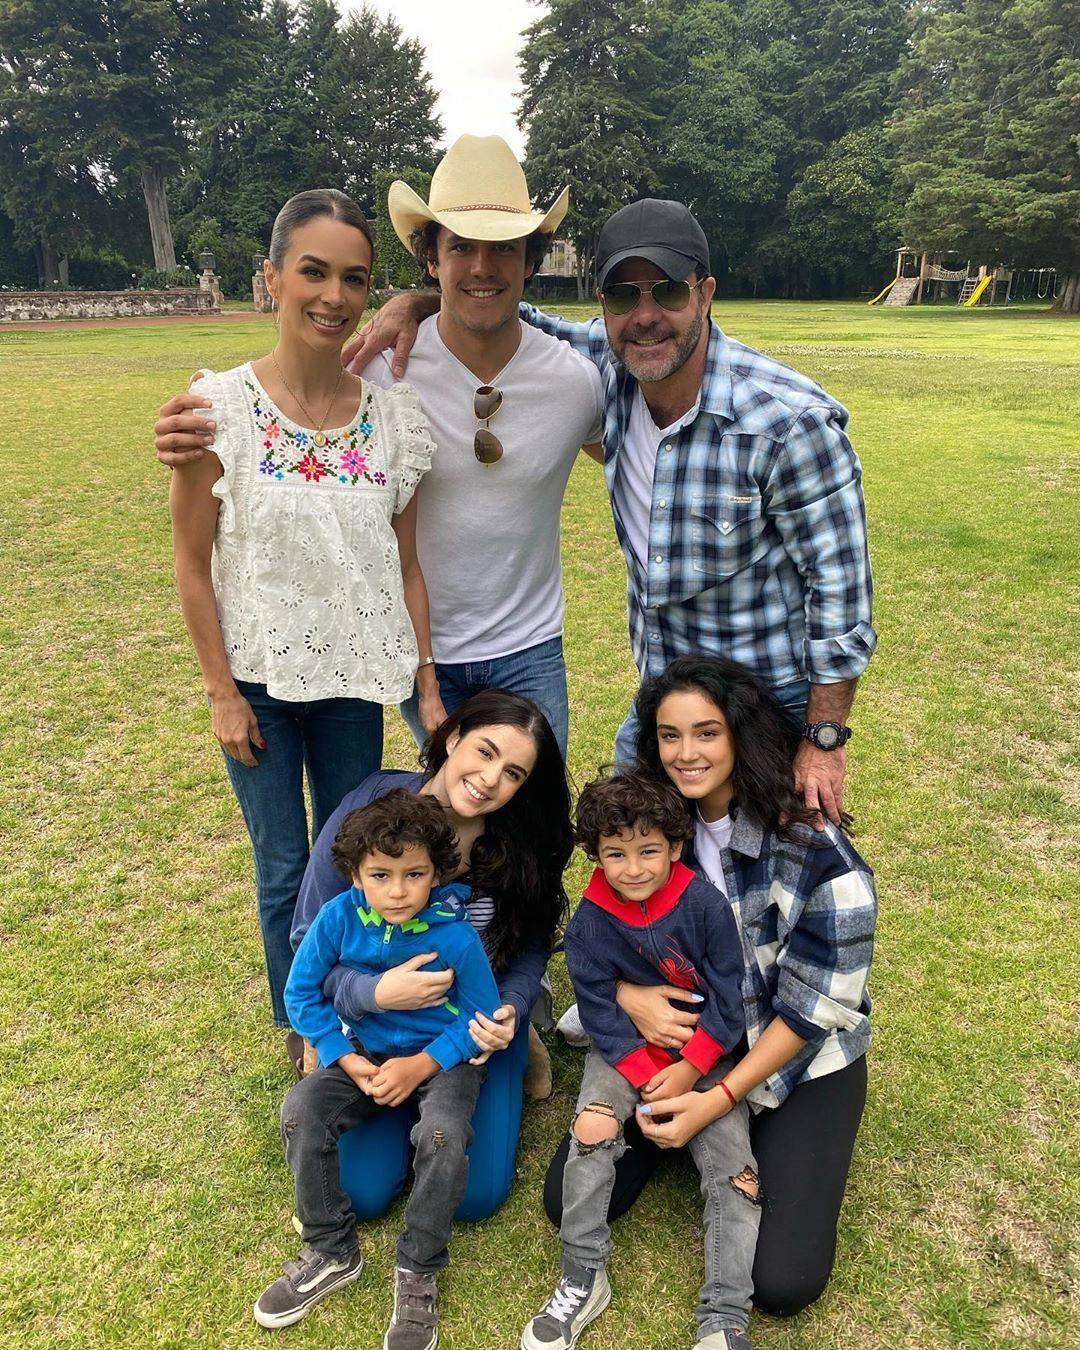 Biby Gaytán y su familia